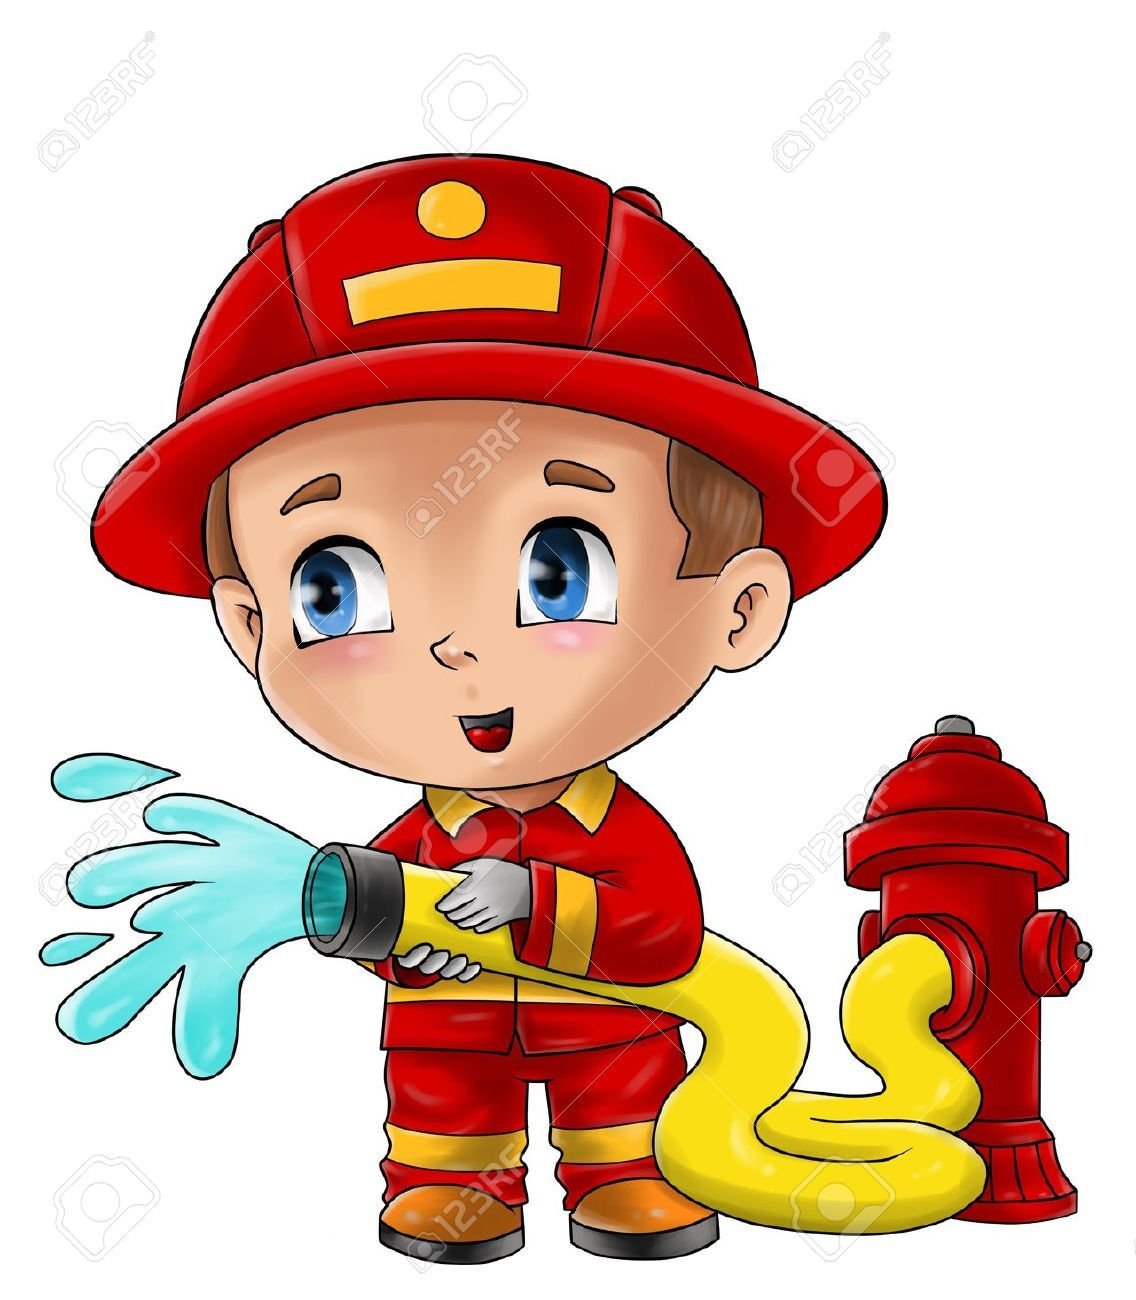 fireman hat images stock